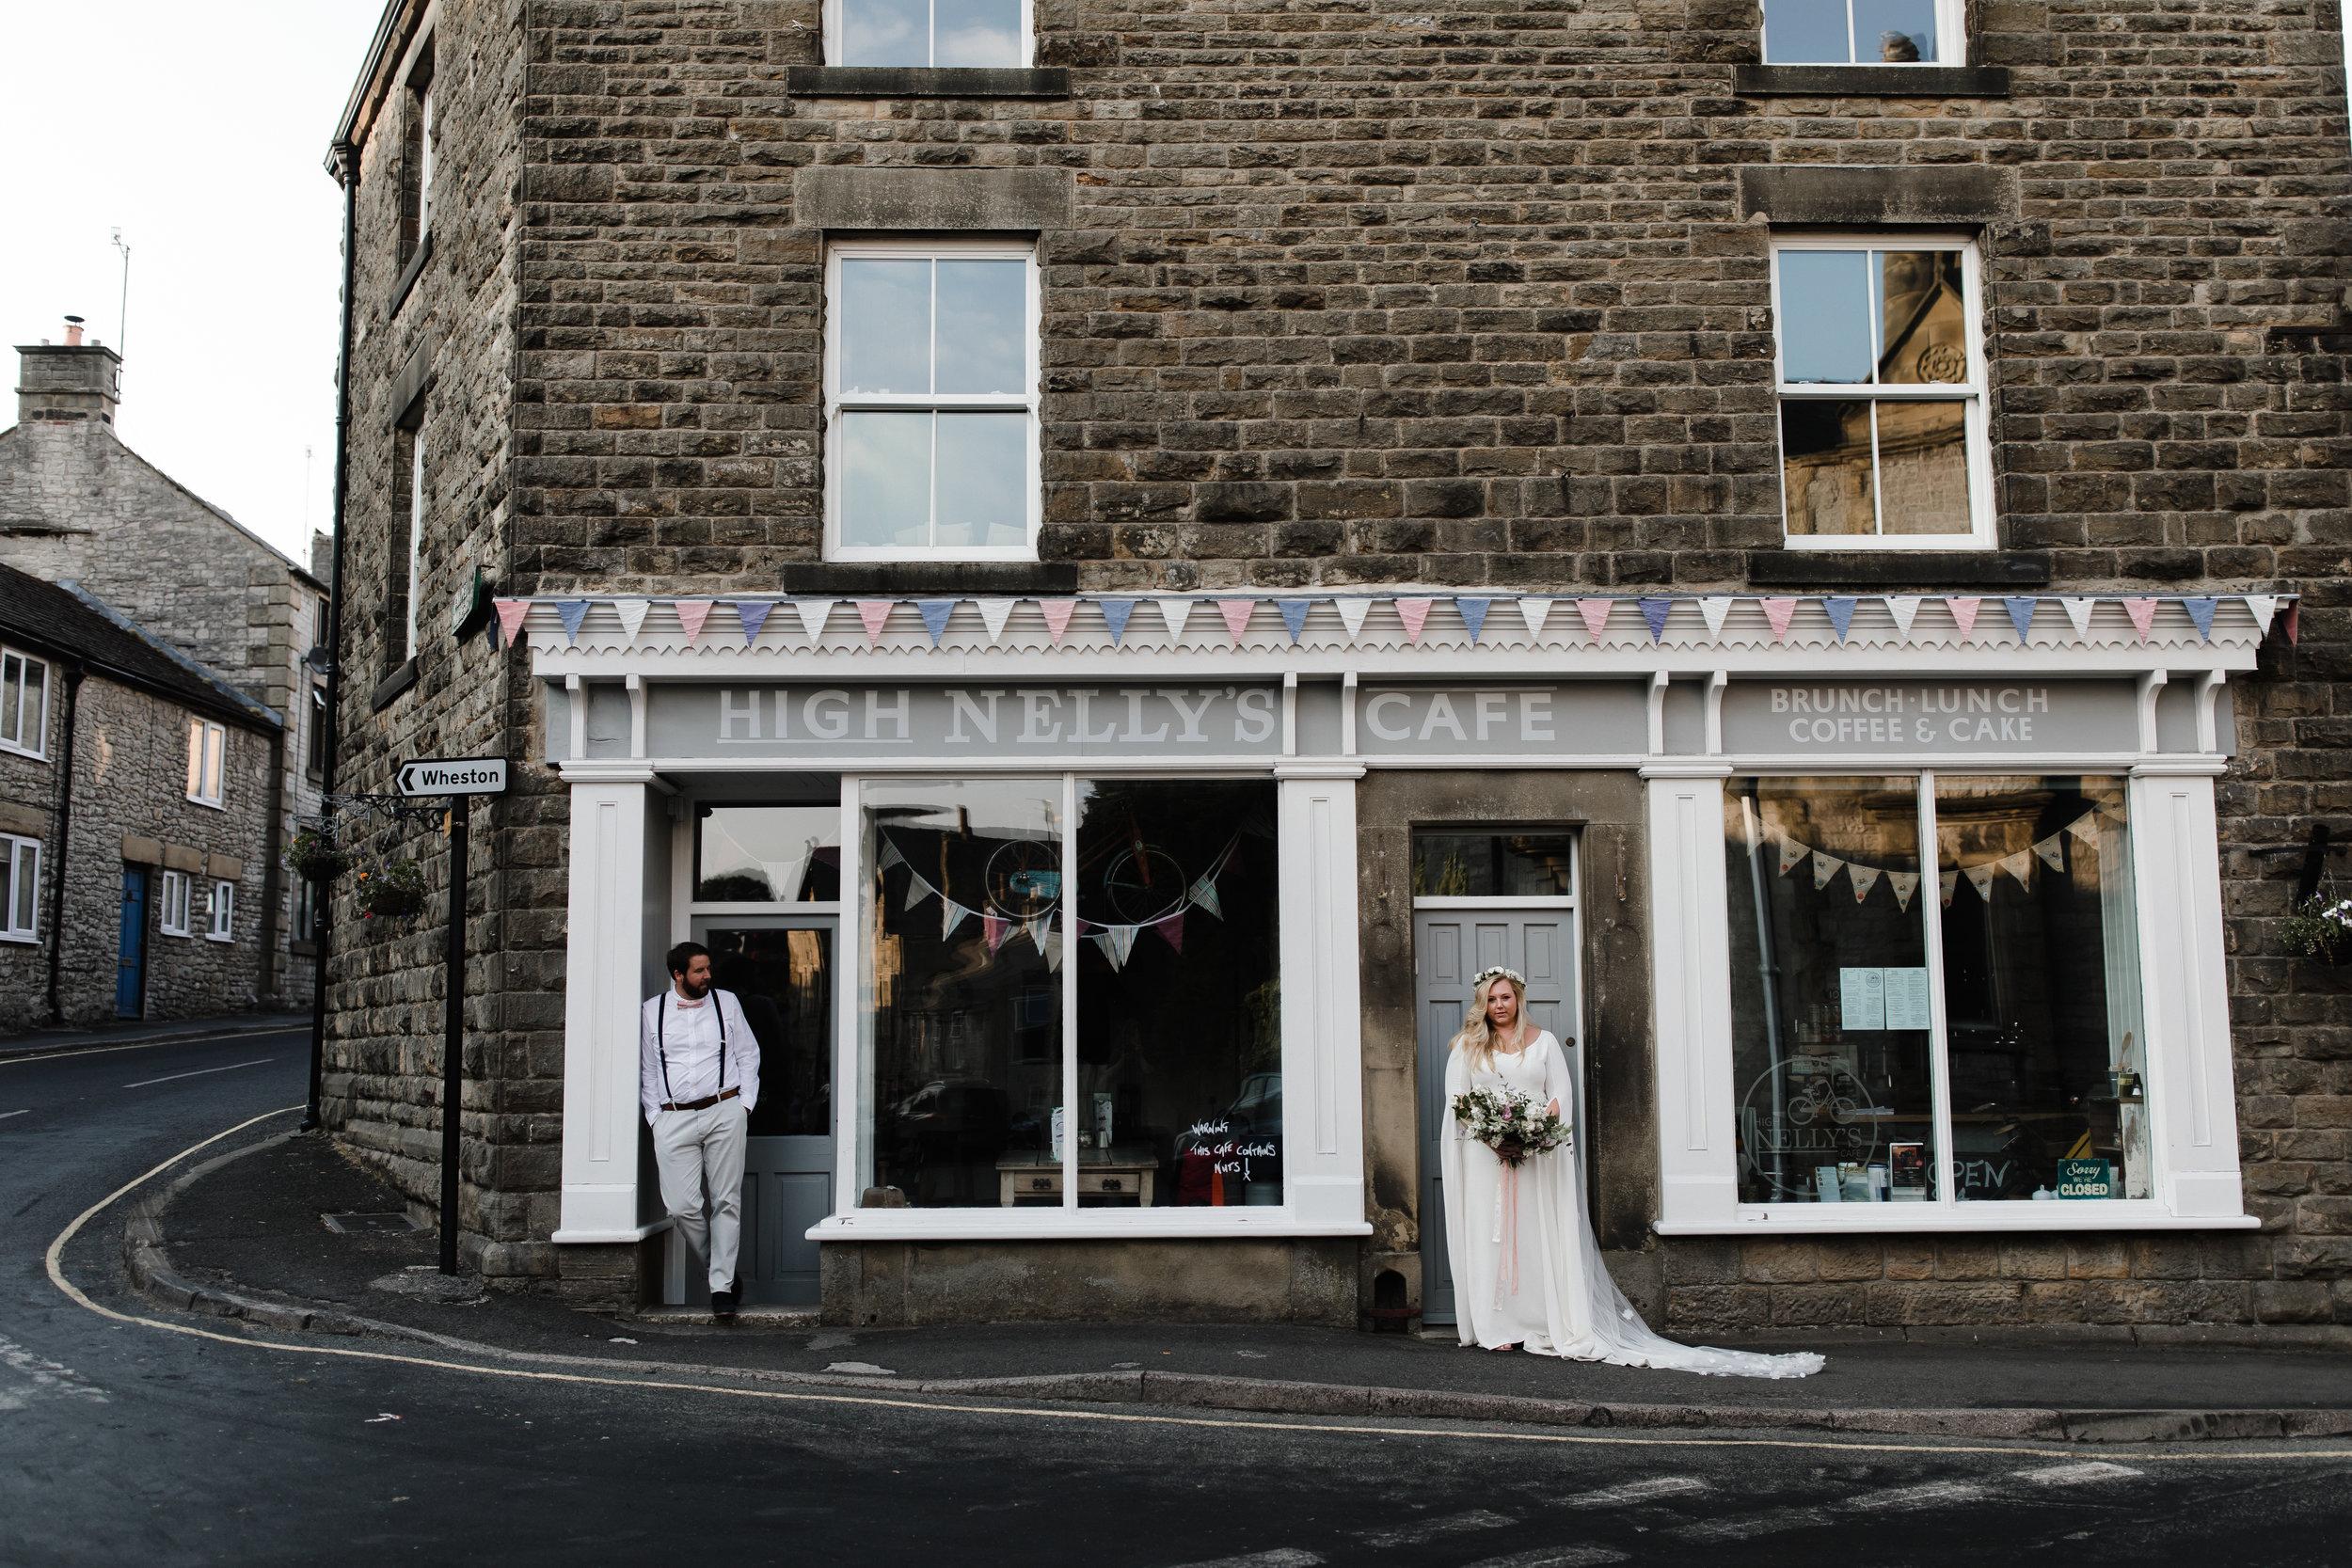 Lauren-Peak-District-Bespoke-Wedding-Gown-Petal-Veil-Train-Long-Sleeve-Susanna-Greening-Designs-Matlock-Derbyshire-21